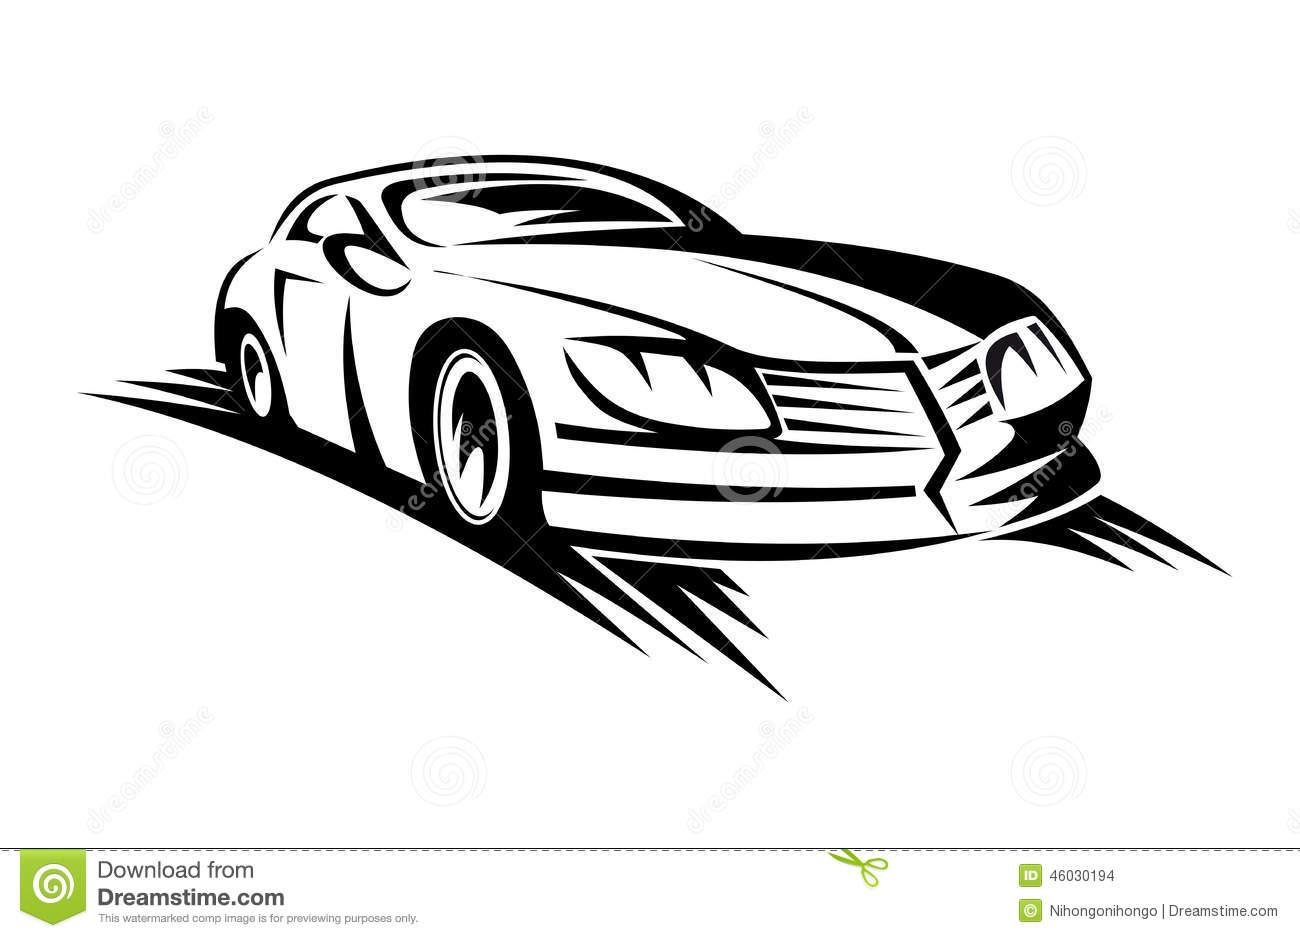 Ferrari clipart fast car  fast Fast Free Clipart